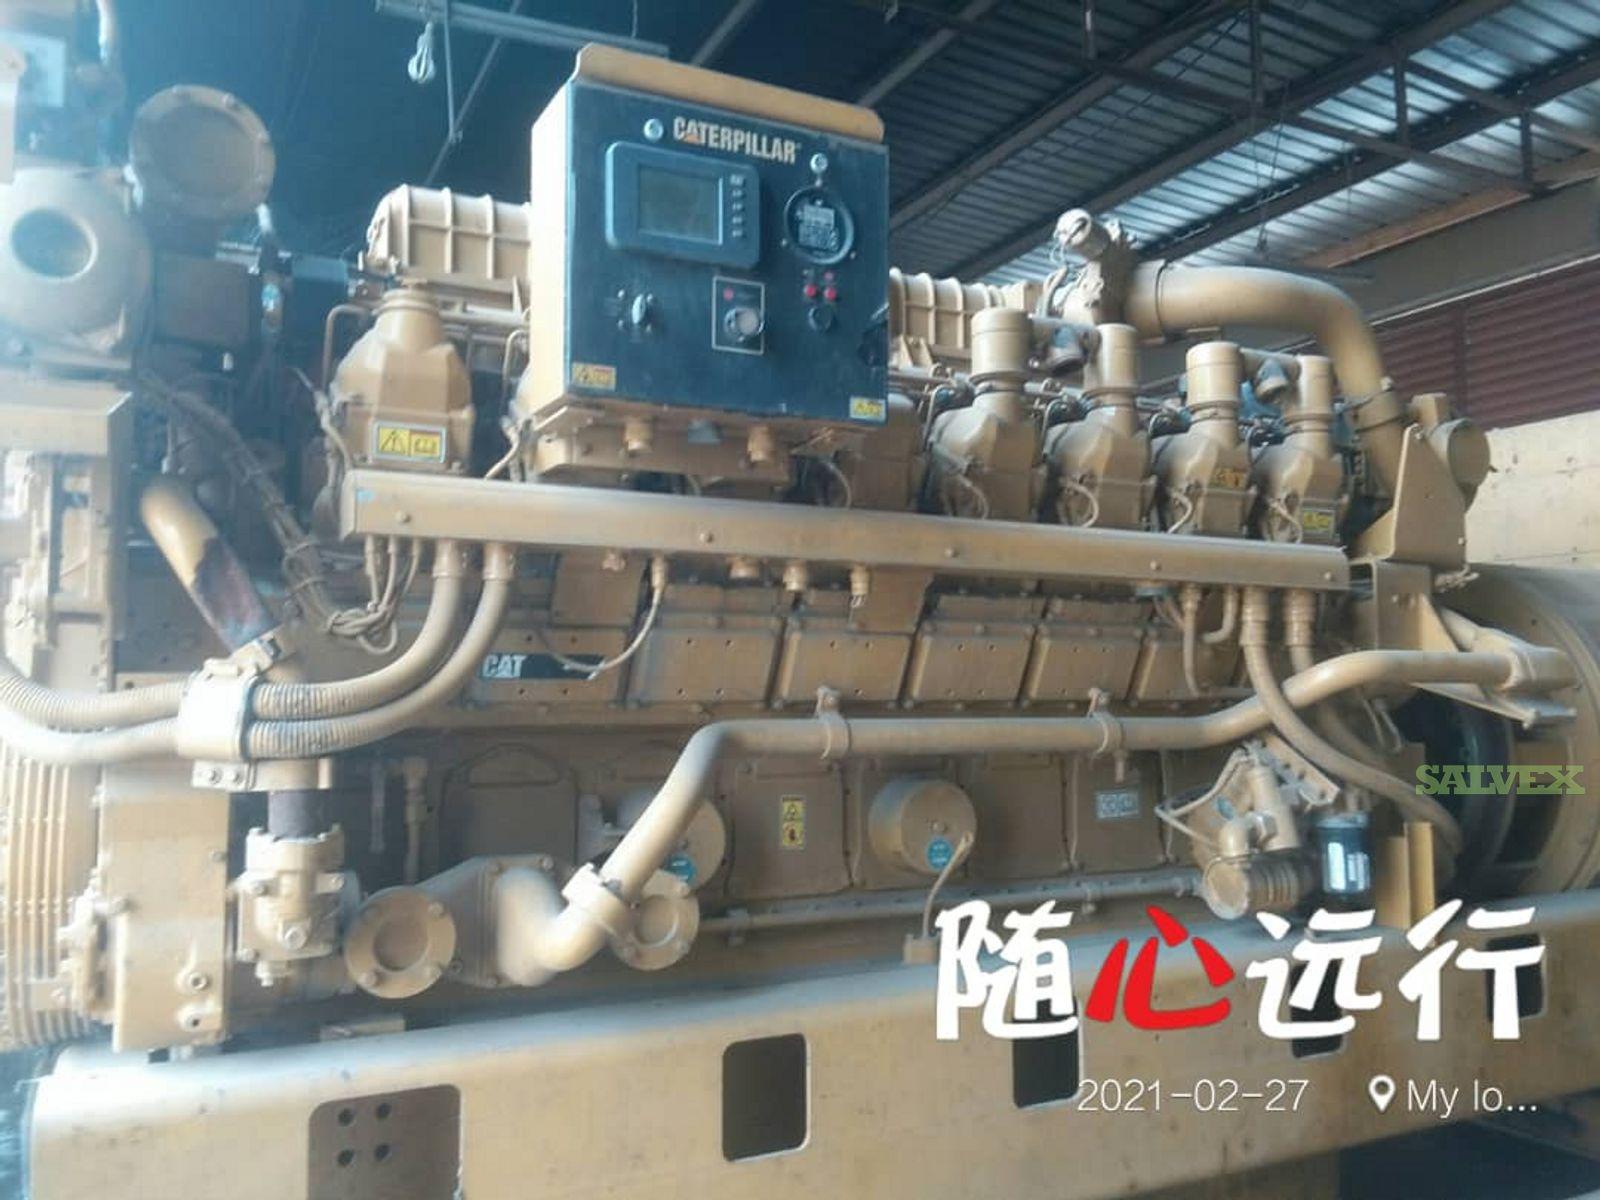 Caterpillar 3512 & 3516 Generators (3 Units)